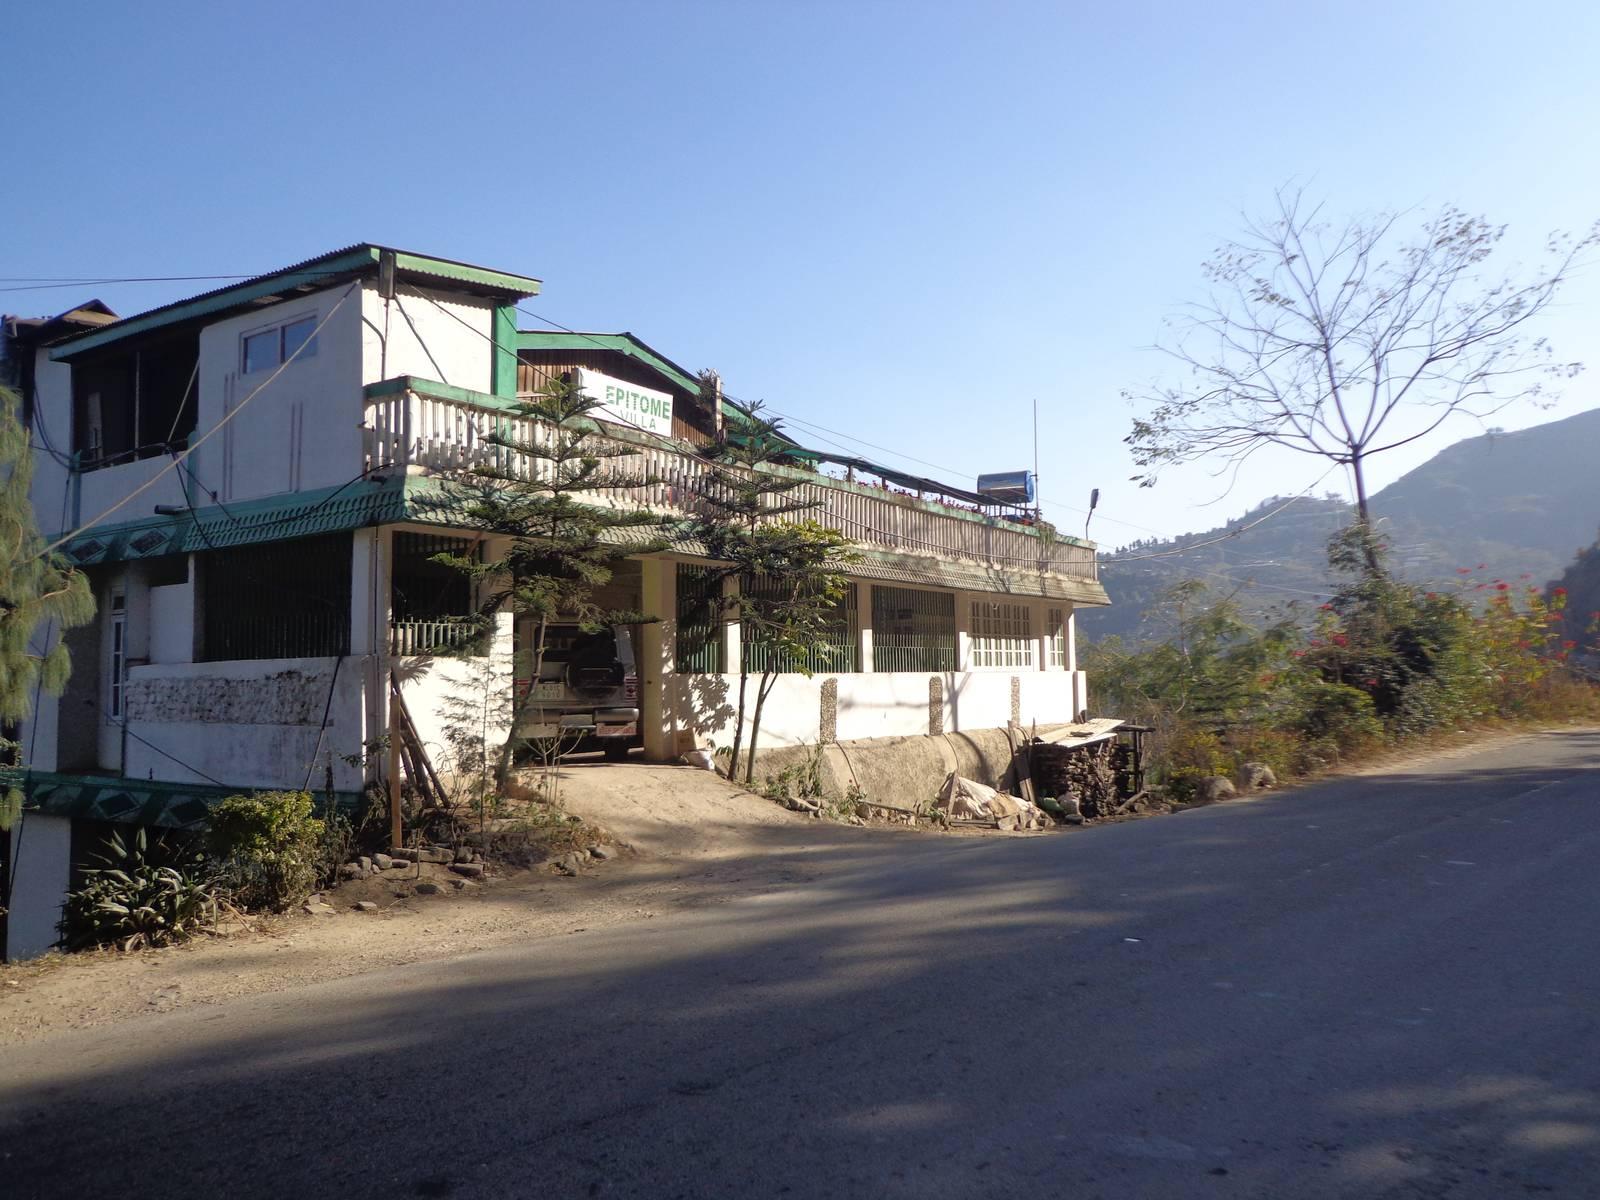 Epitome villa: Lalhou's homestay.